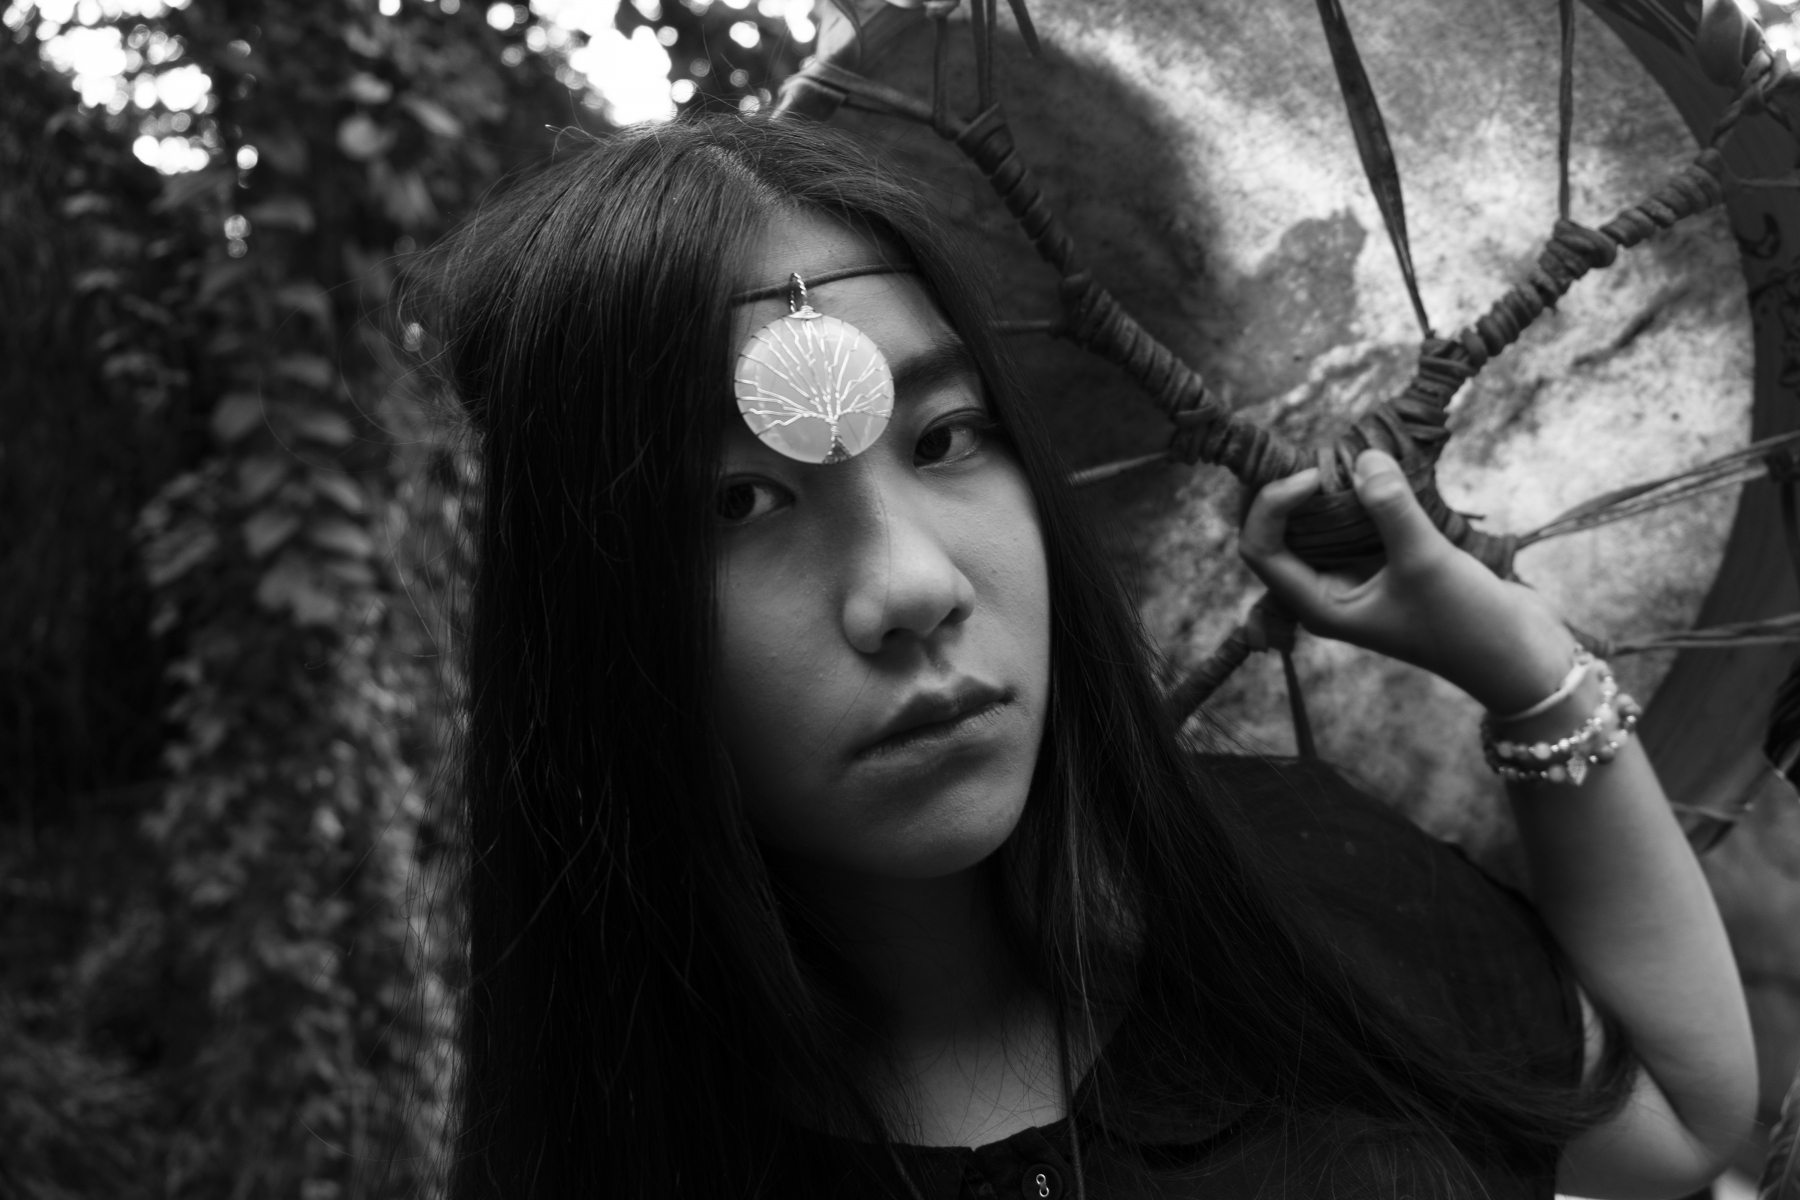 03_Impression of Anunnaki- sister's portrait